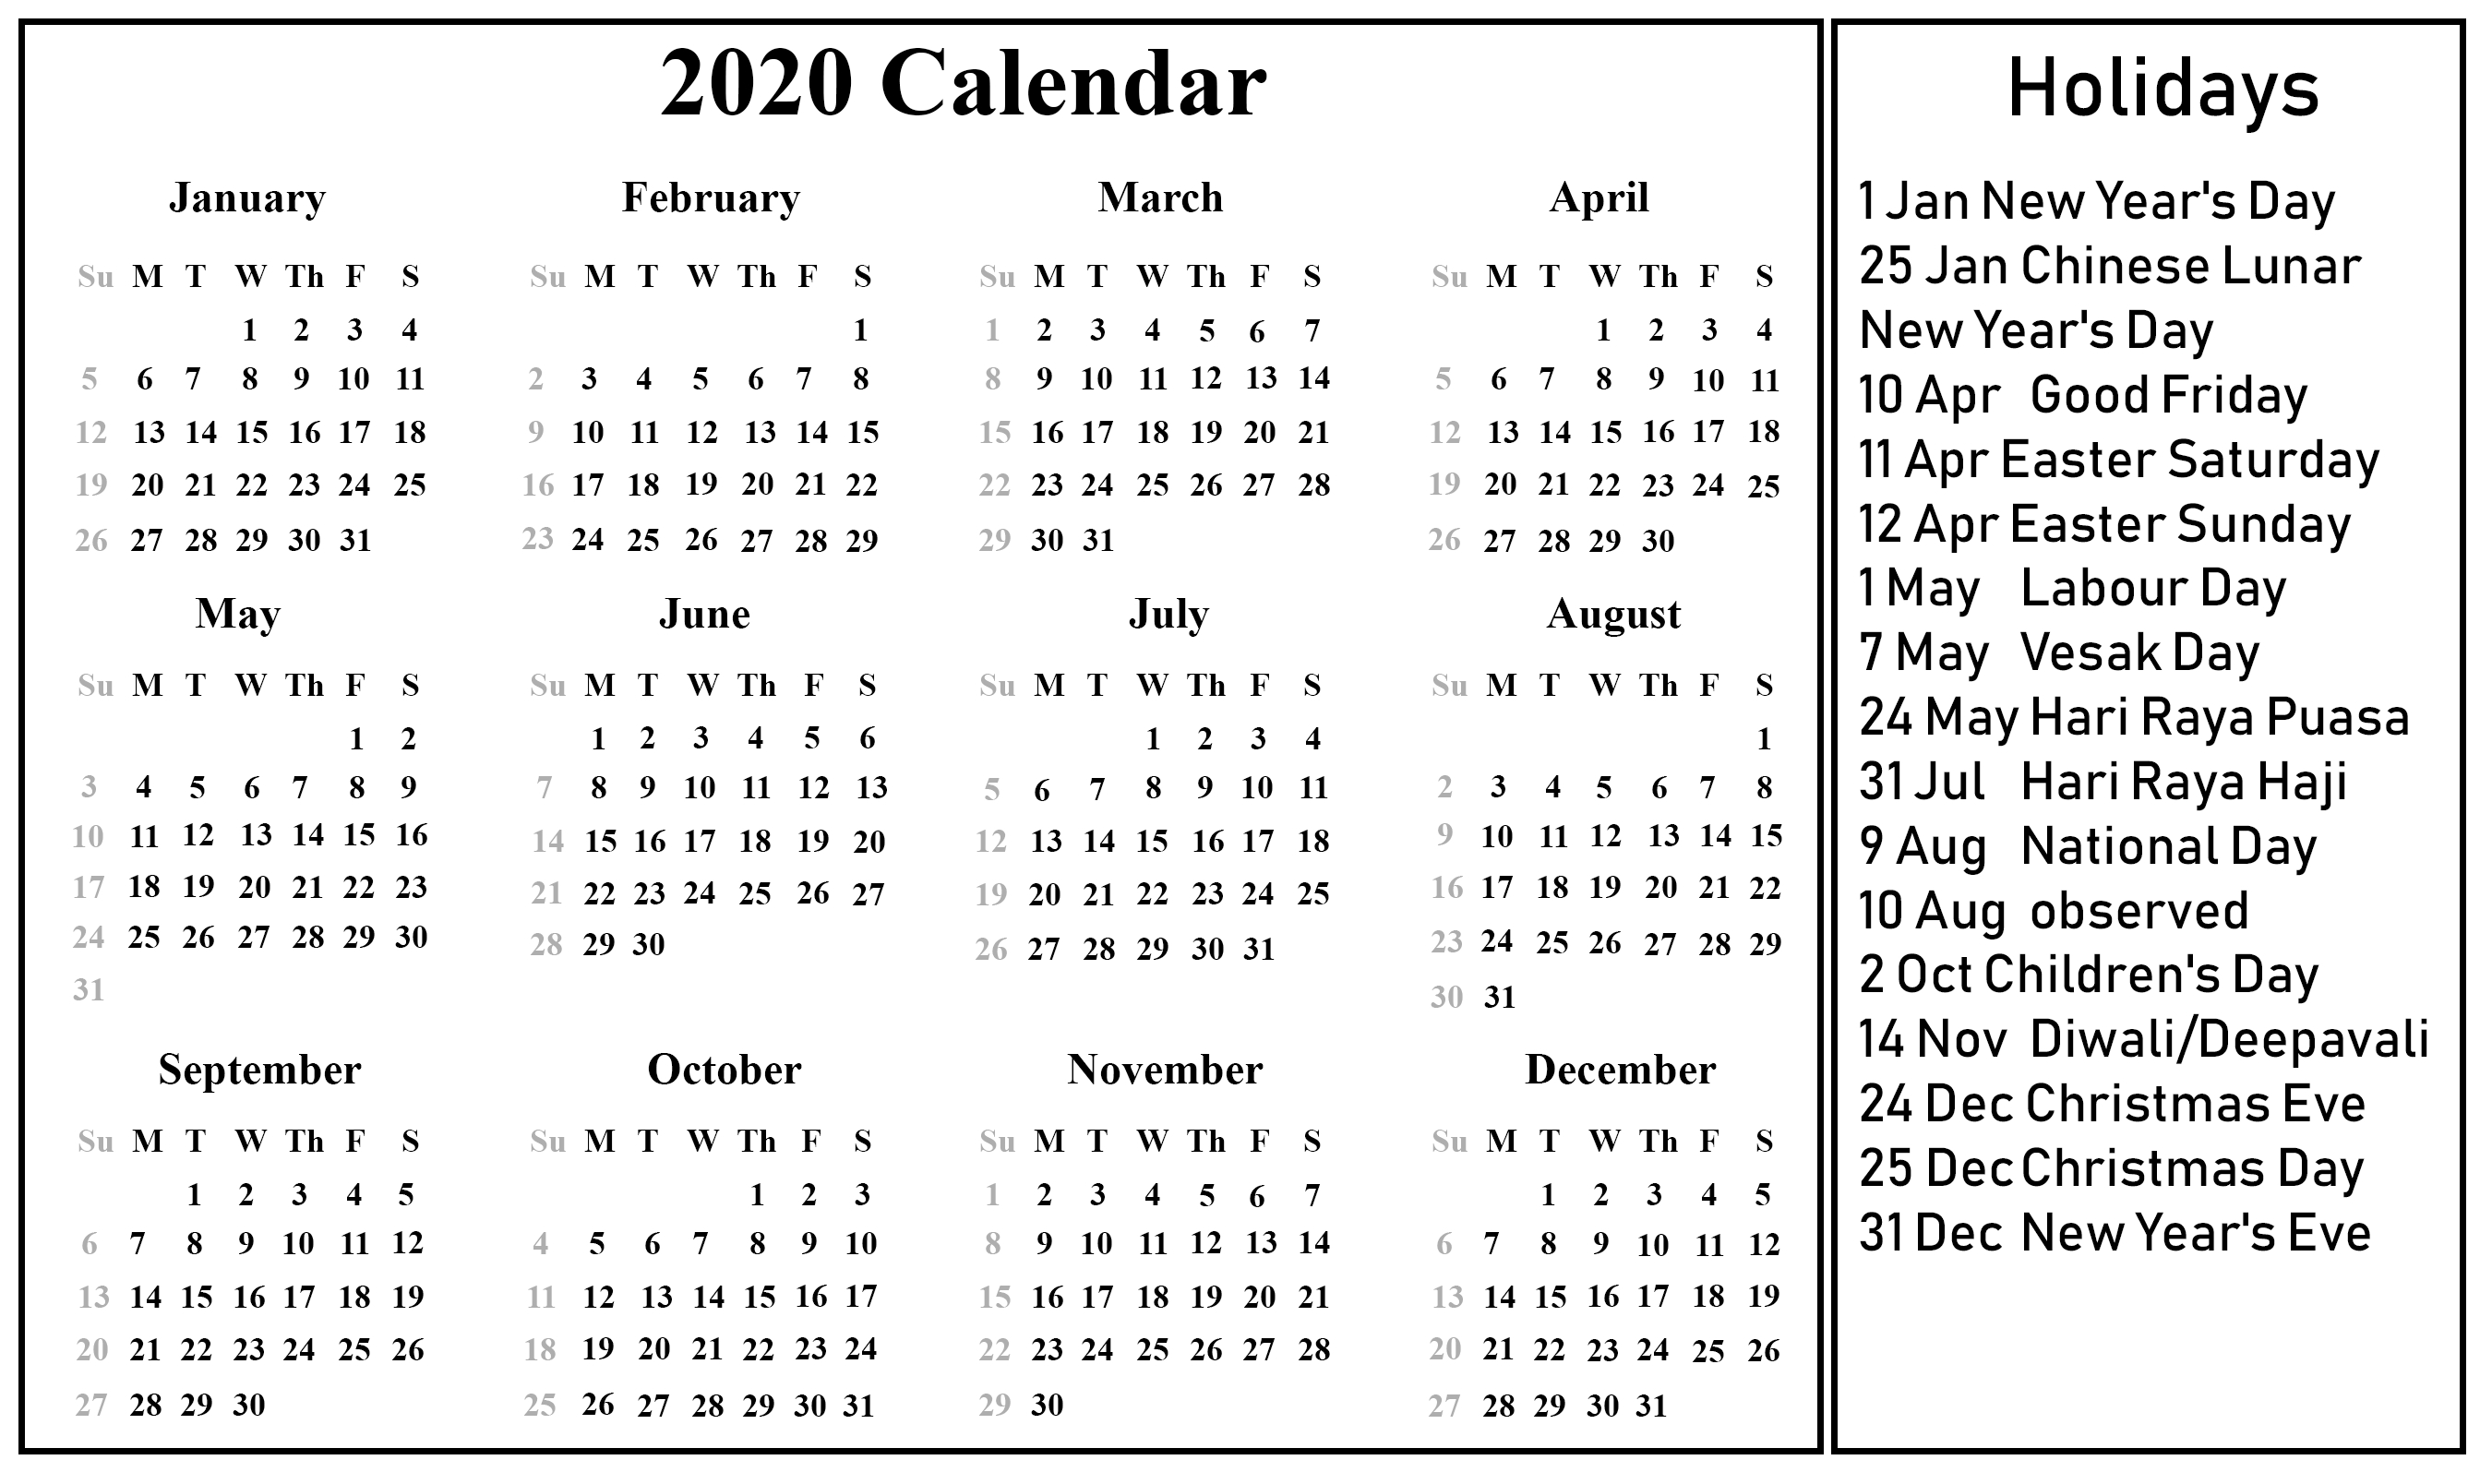 Singapore 2020 Printable Holidays Calendar | Printable Printable Chinese Lunar Calendar 2020